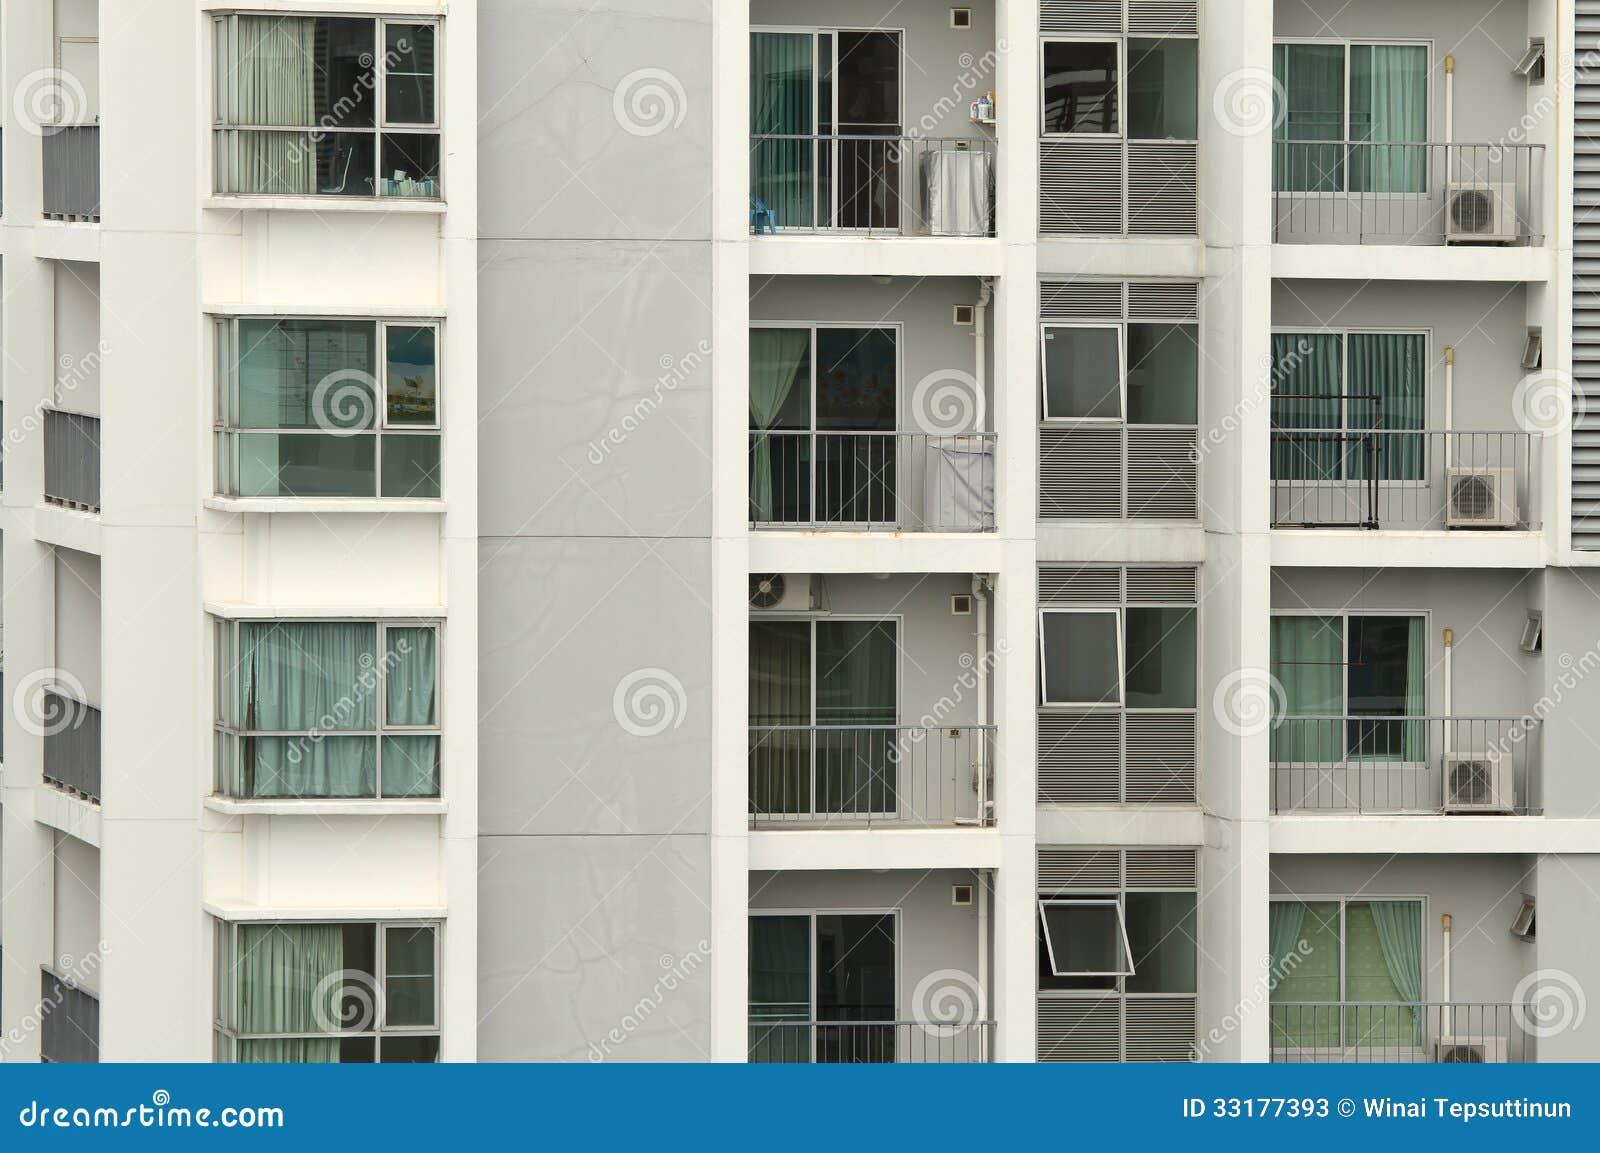 Apartment Building Front apartment building stock photos - image: 33177393